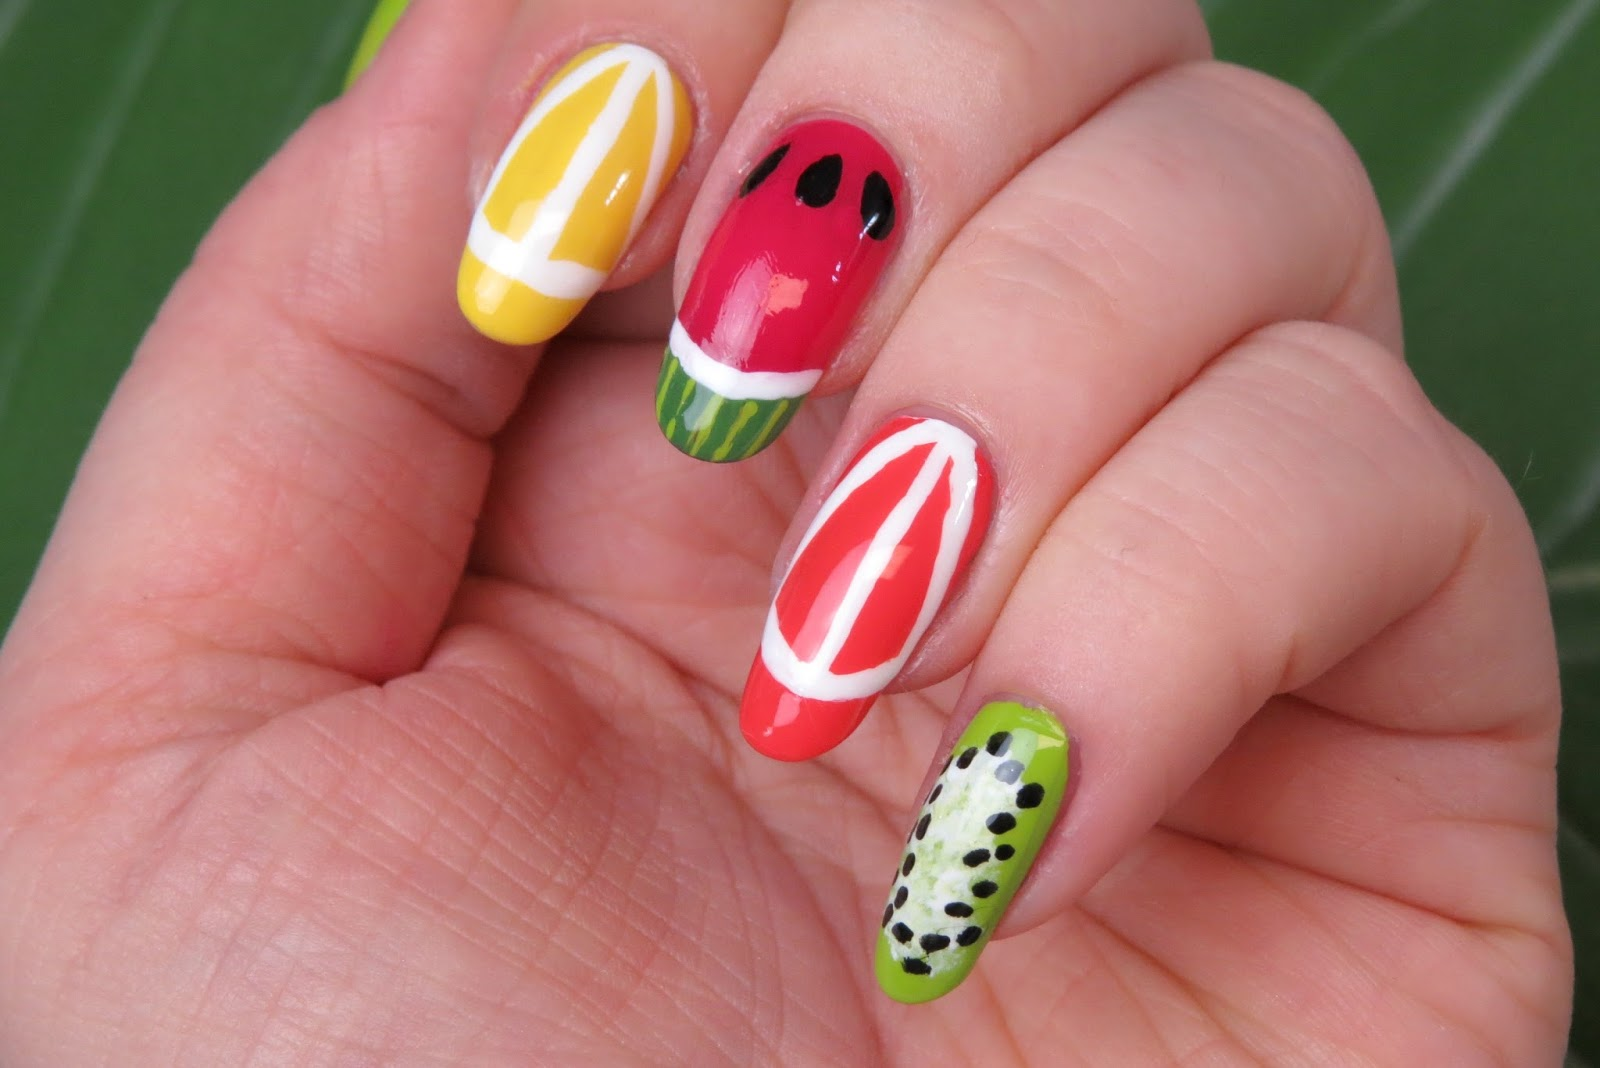 Mani monday summertime fruit kaitlyn elisabeth beauty fruit nail art design lemon nail art design orange nail art design watermelon nail art design prinsesfo Image collections